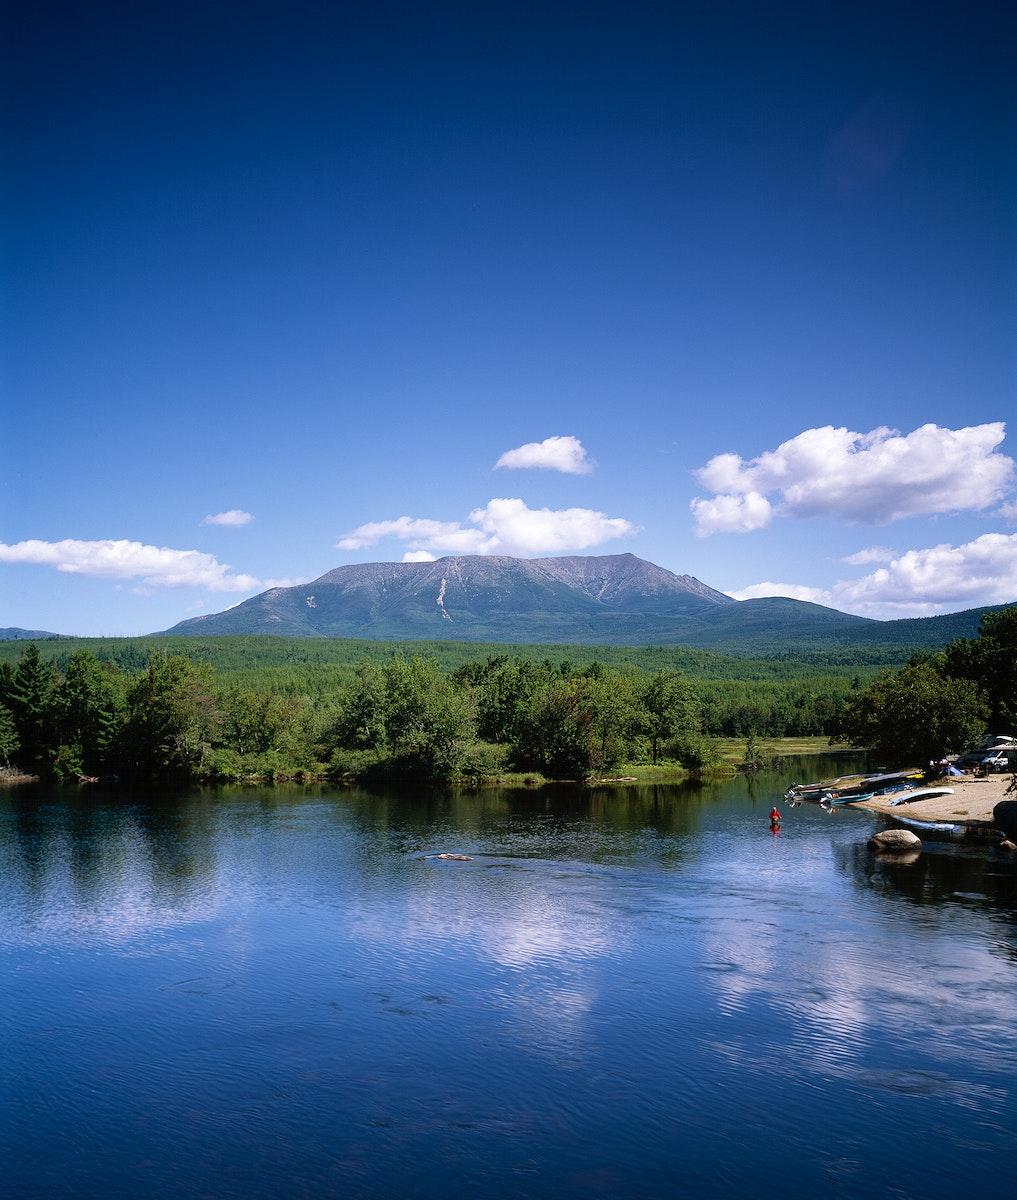 Mount Katahdin, Maine, Appalachian Trail. Original image from Carol M. Highsmith's America, Library of Congress…